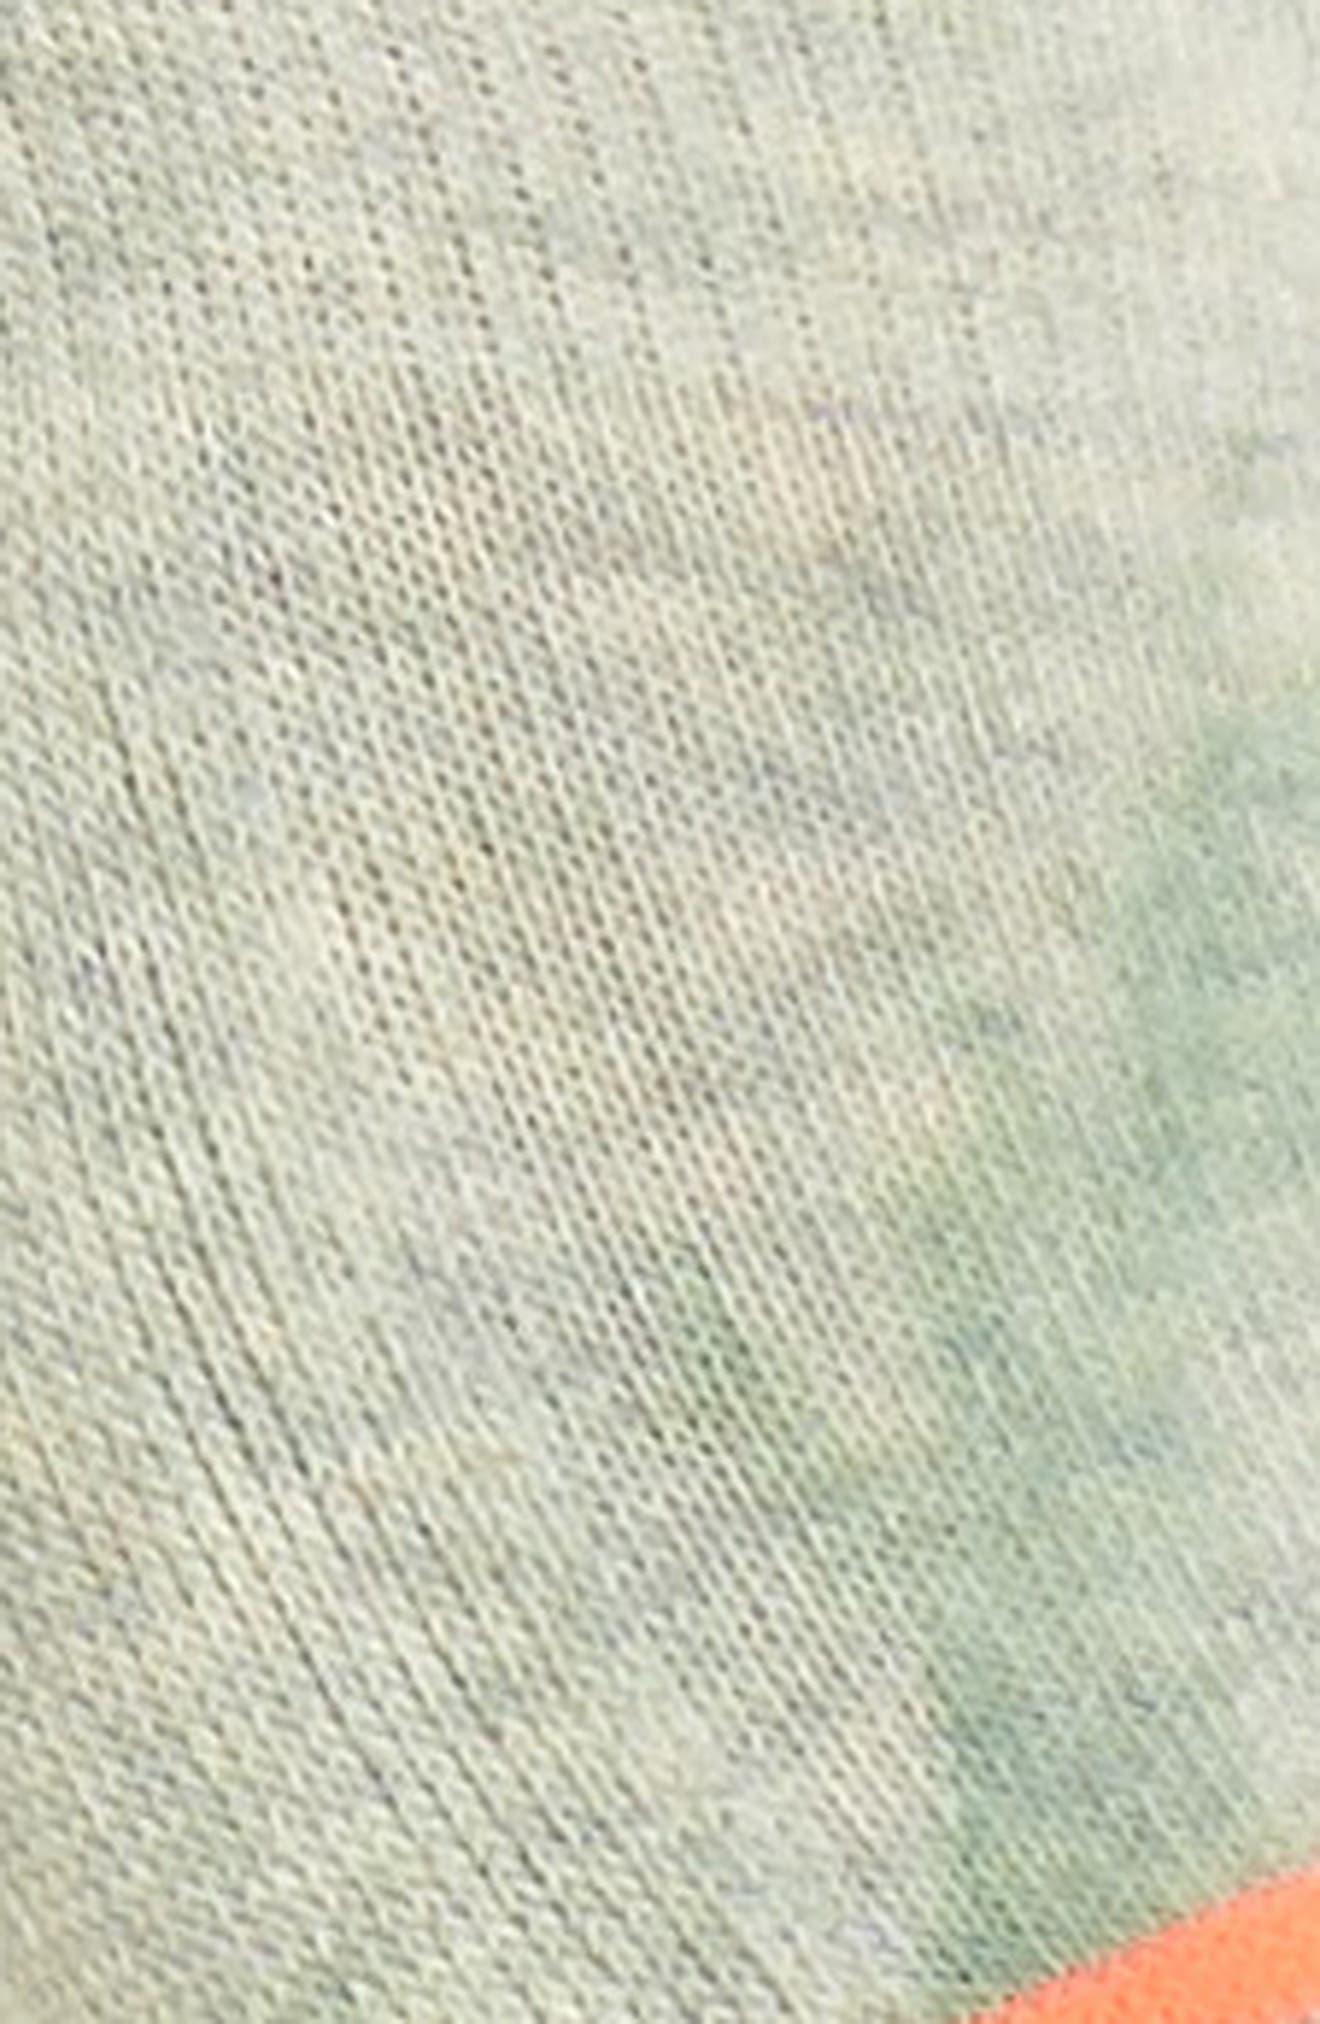 Mint No-Show Socks,                             Alternate thumbnail 3, color,                             Mint